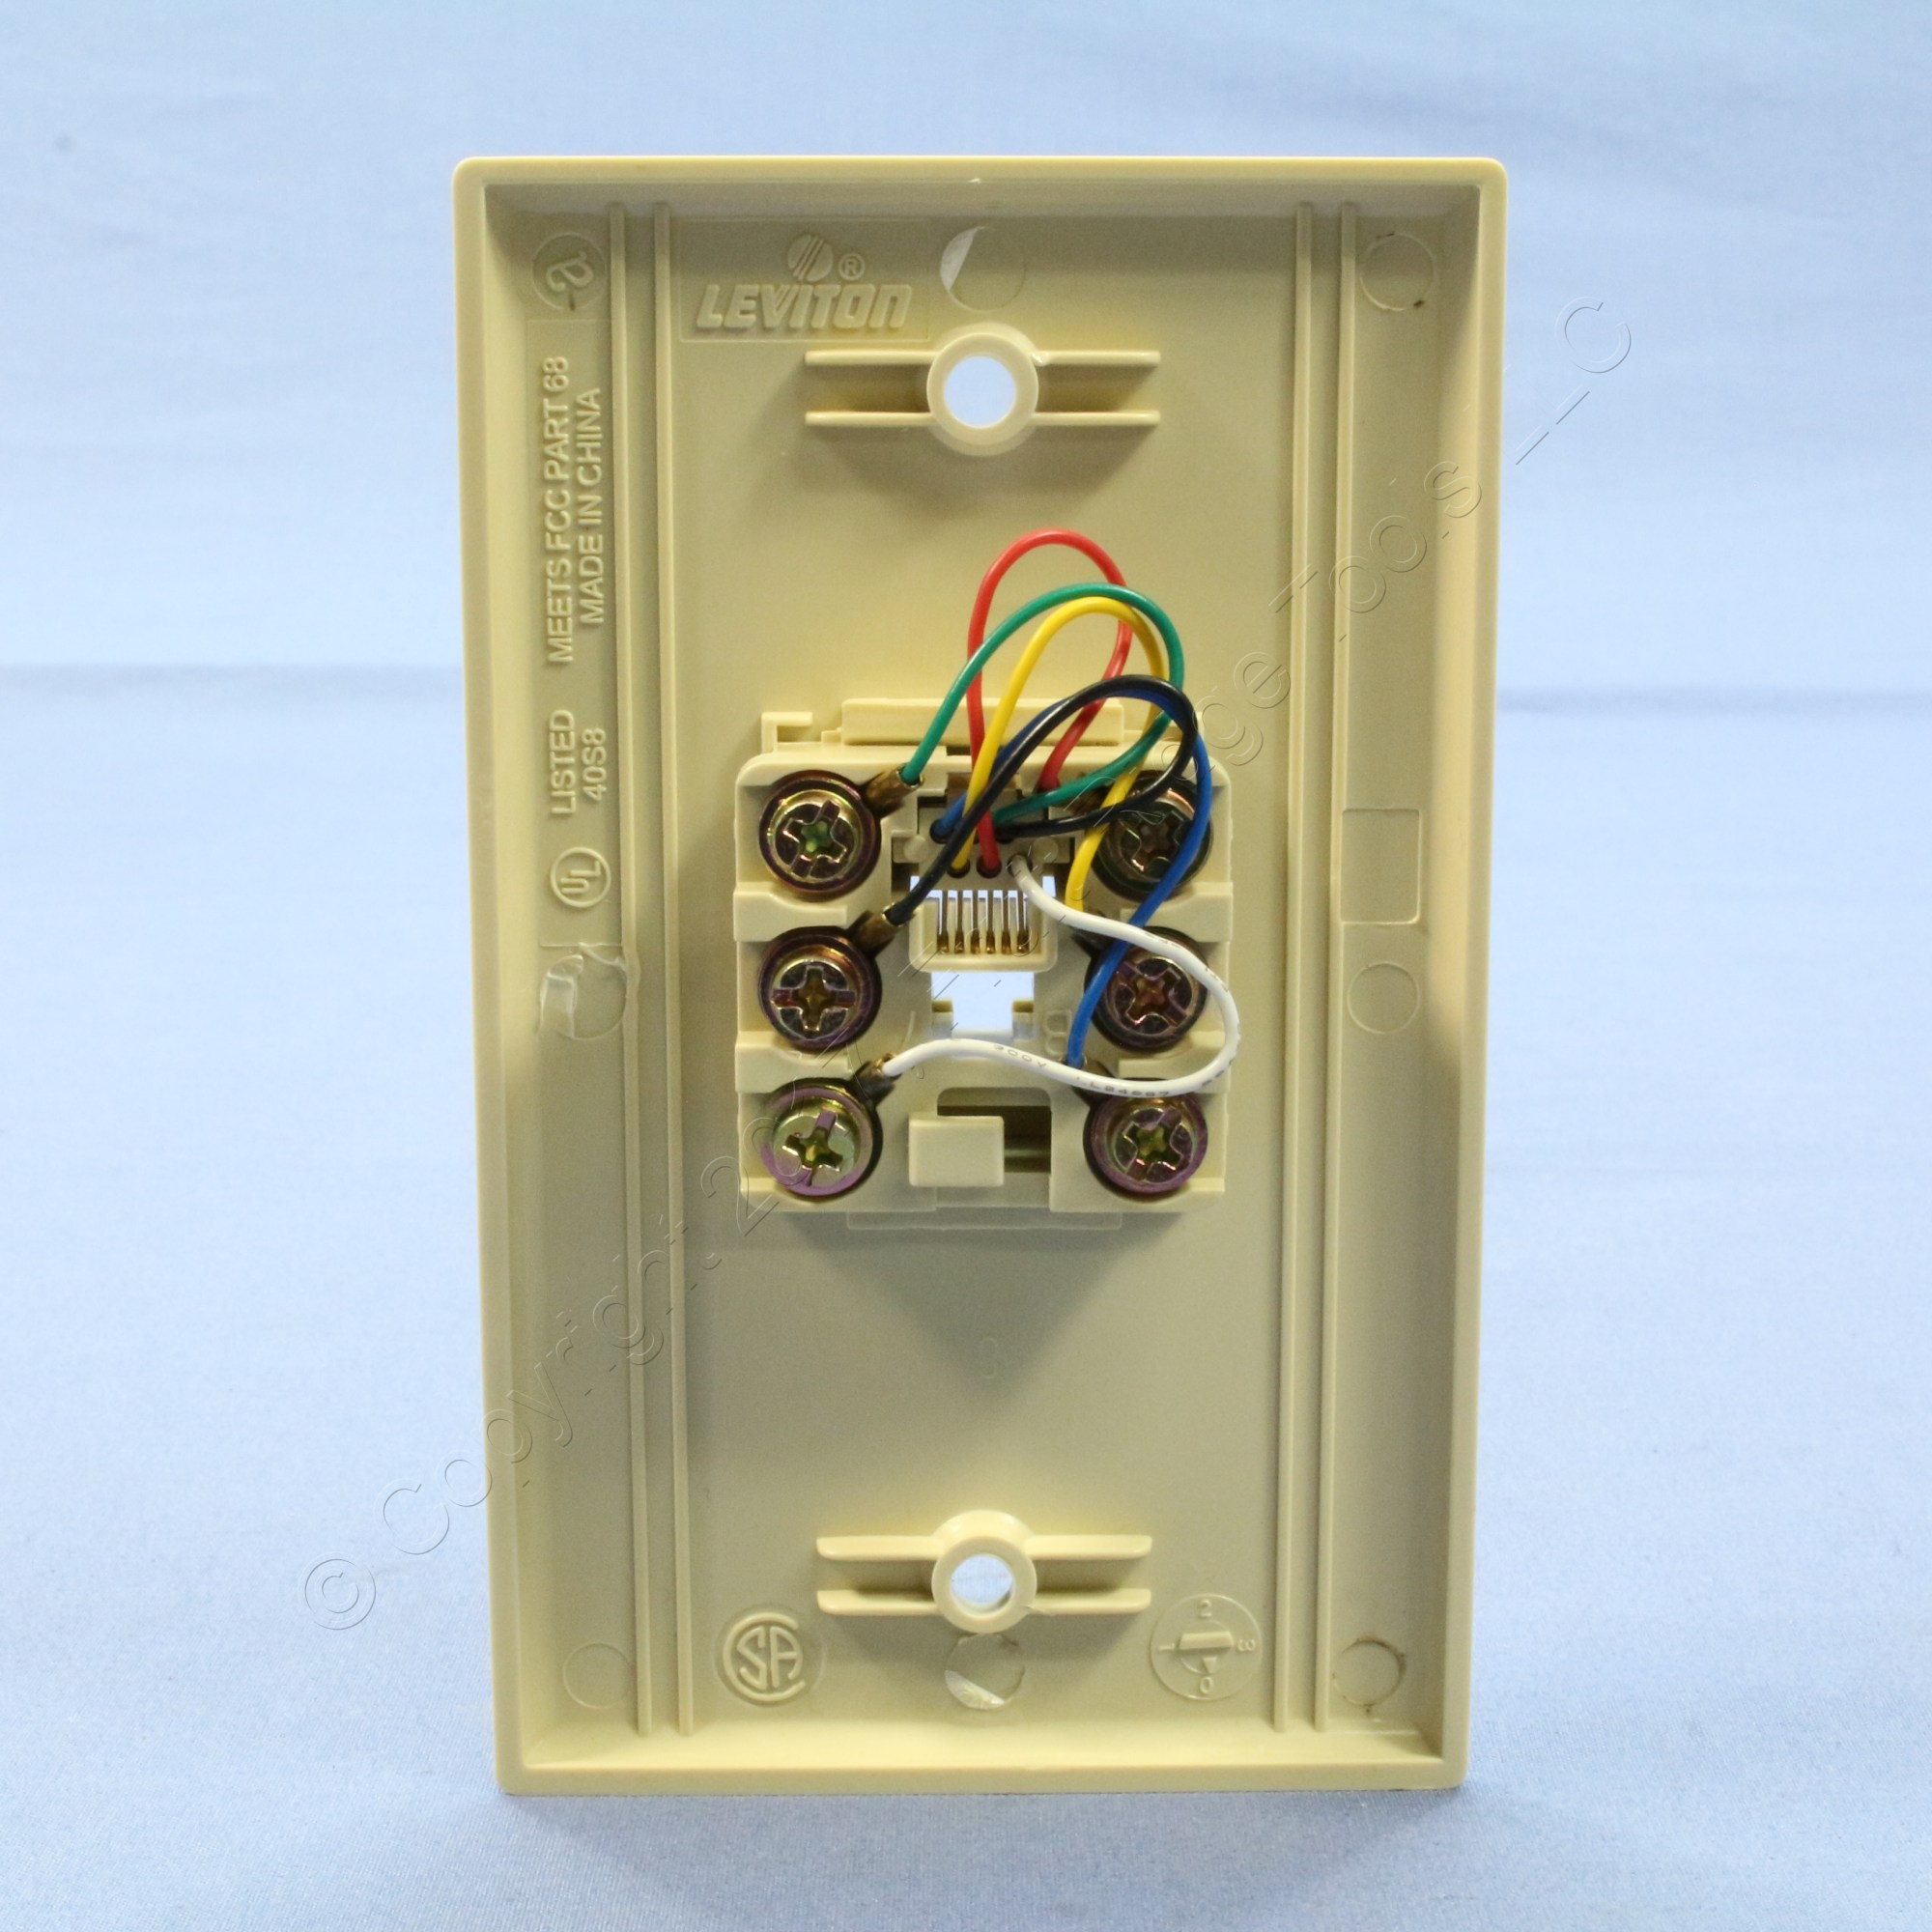 hight resolution of leviton ivory 6 wire modular jack telephone wall plate telephone modular jack wiring diagram telephone modular jack wiring diagram